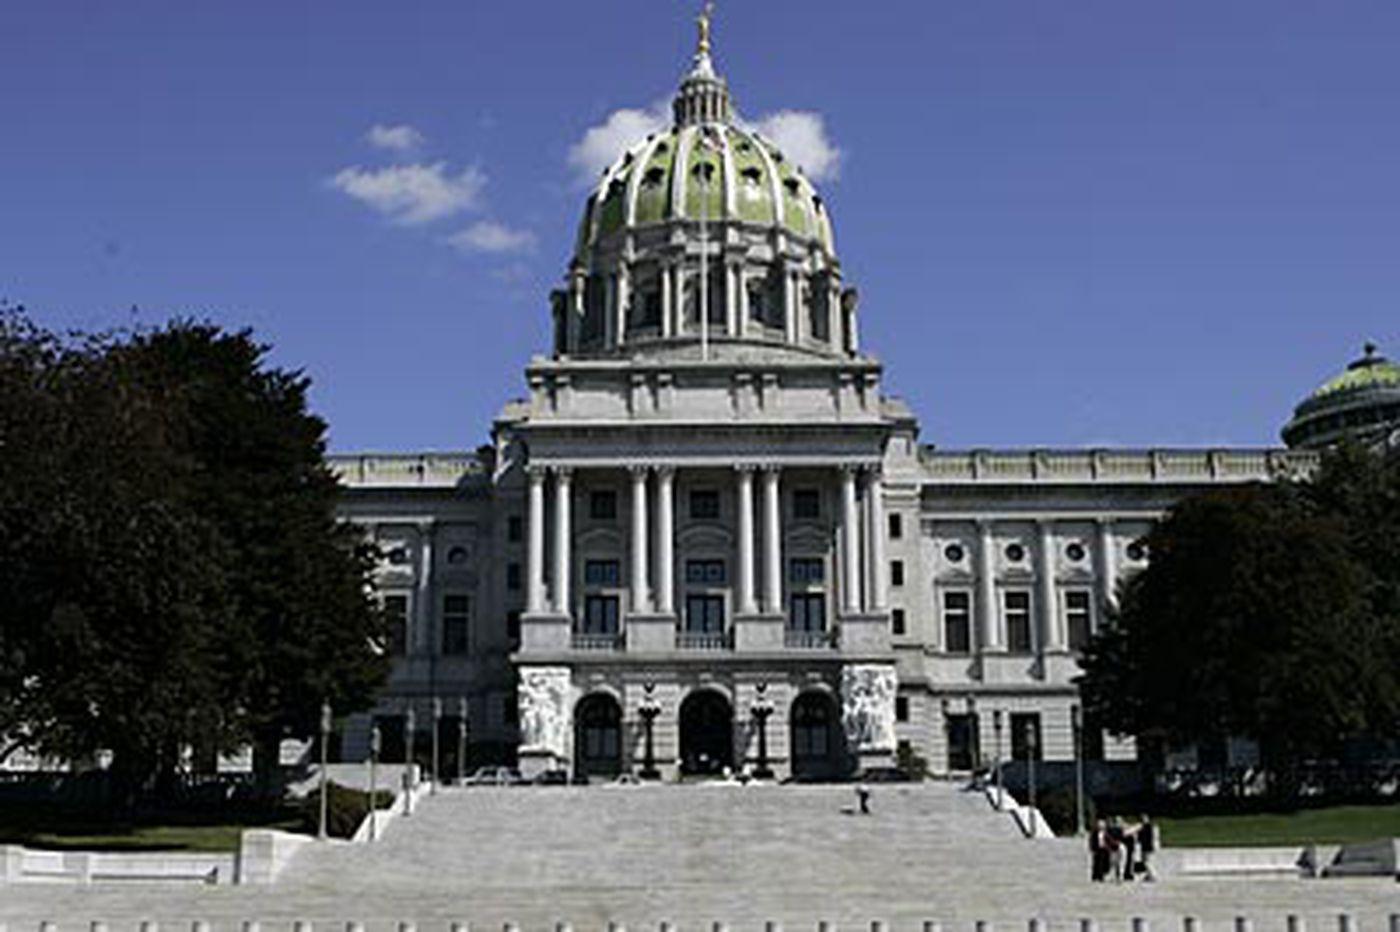 Editorial: This is a legislature?